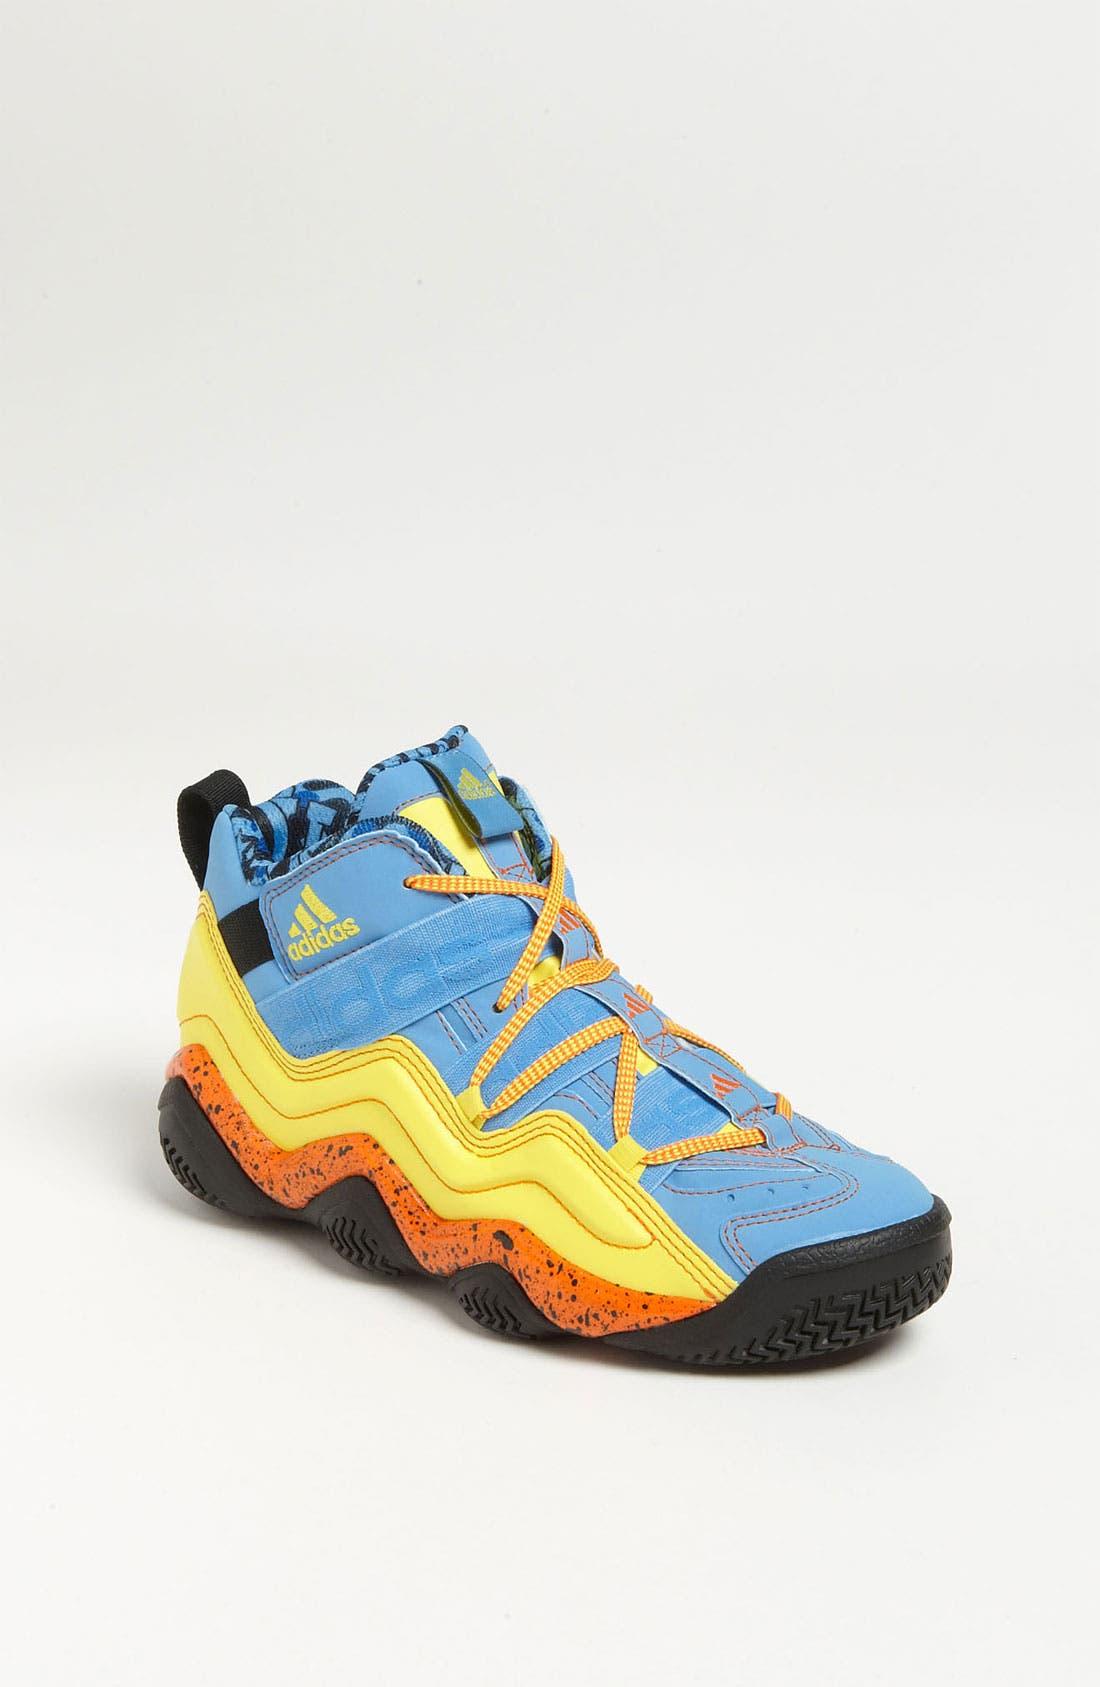 Main Image - adidas 'Top Ten 2000' Sneaker (Big Kid)